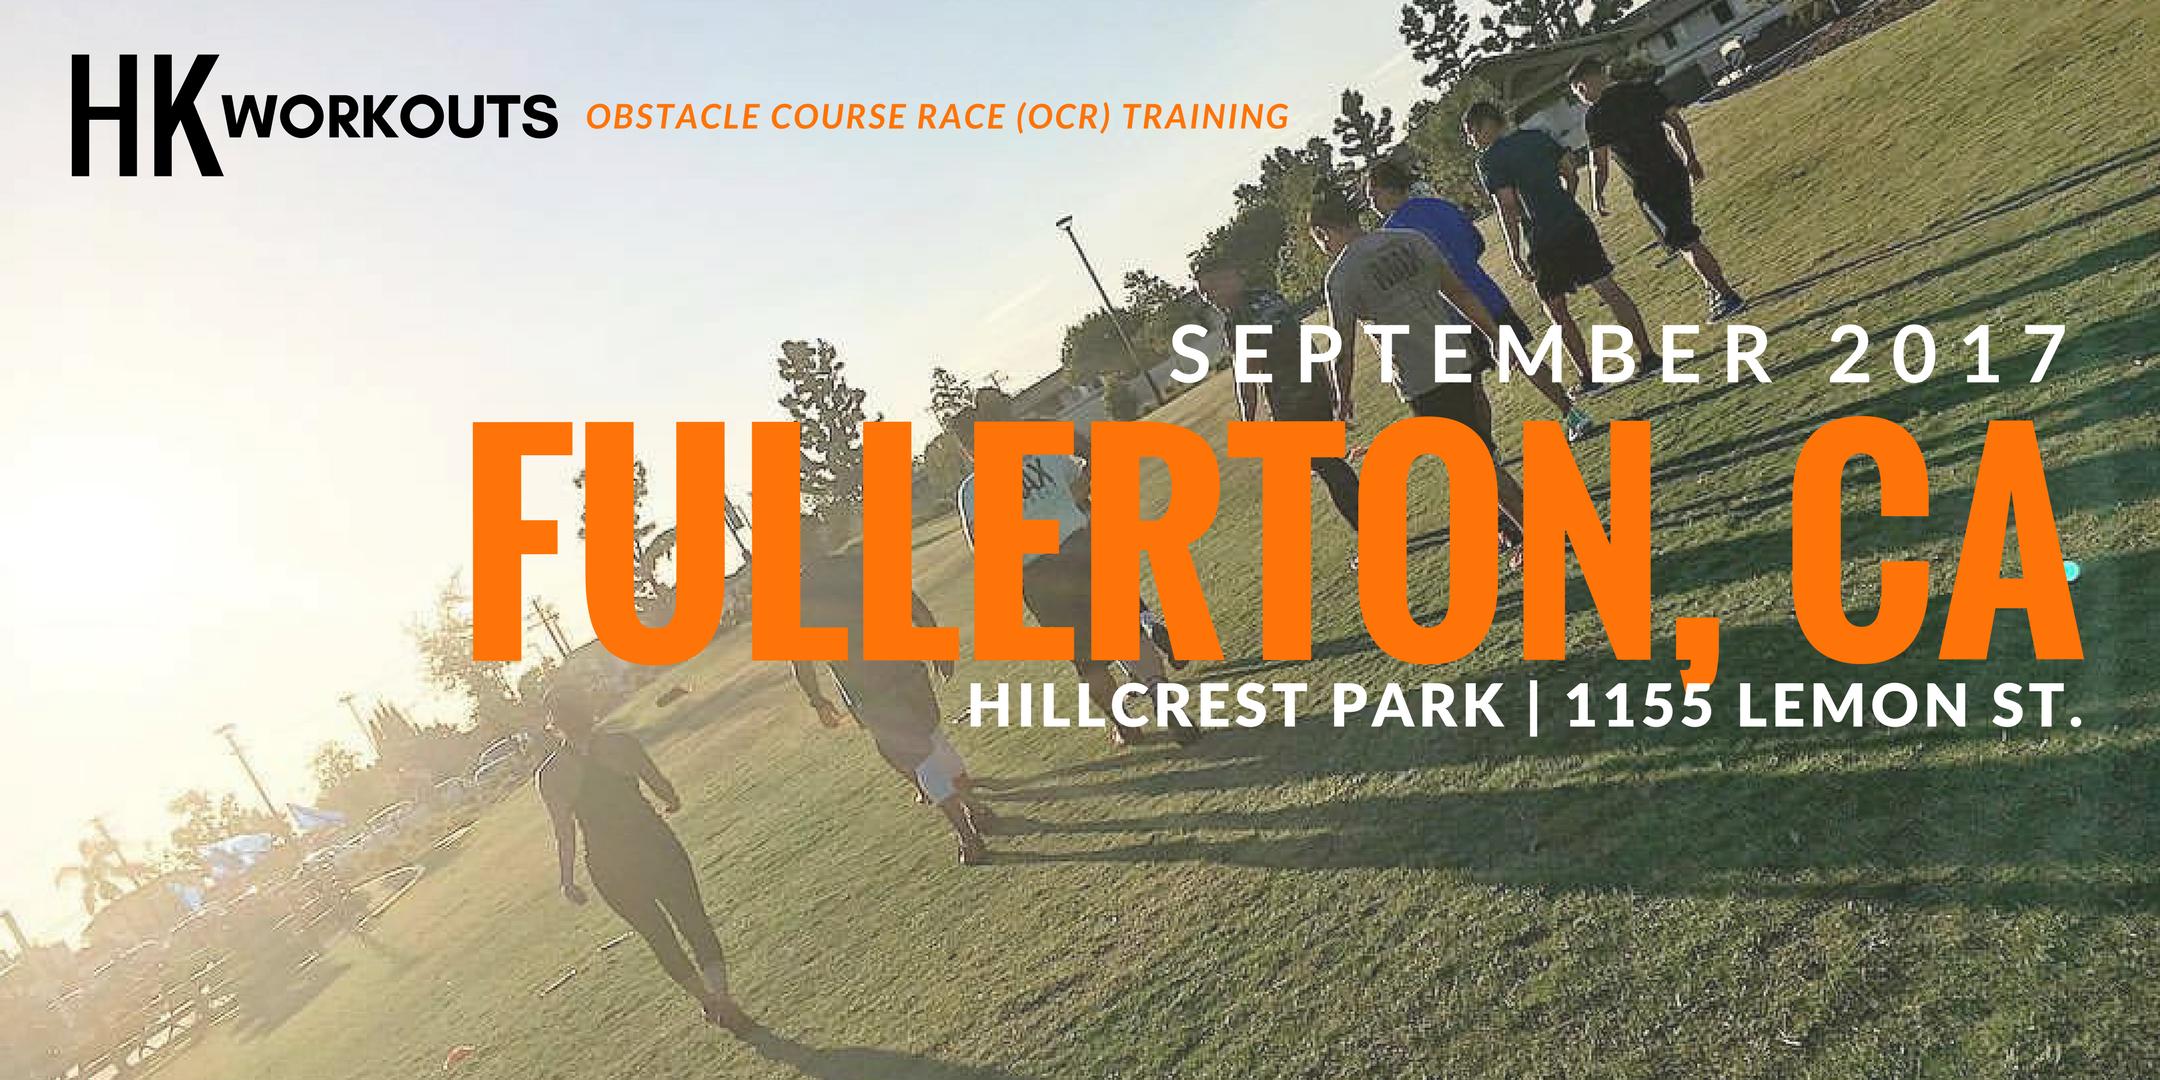 HARDKOUR WORKOUTS - Fullerton, CA // 09.26.17